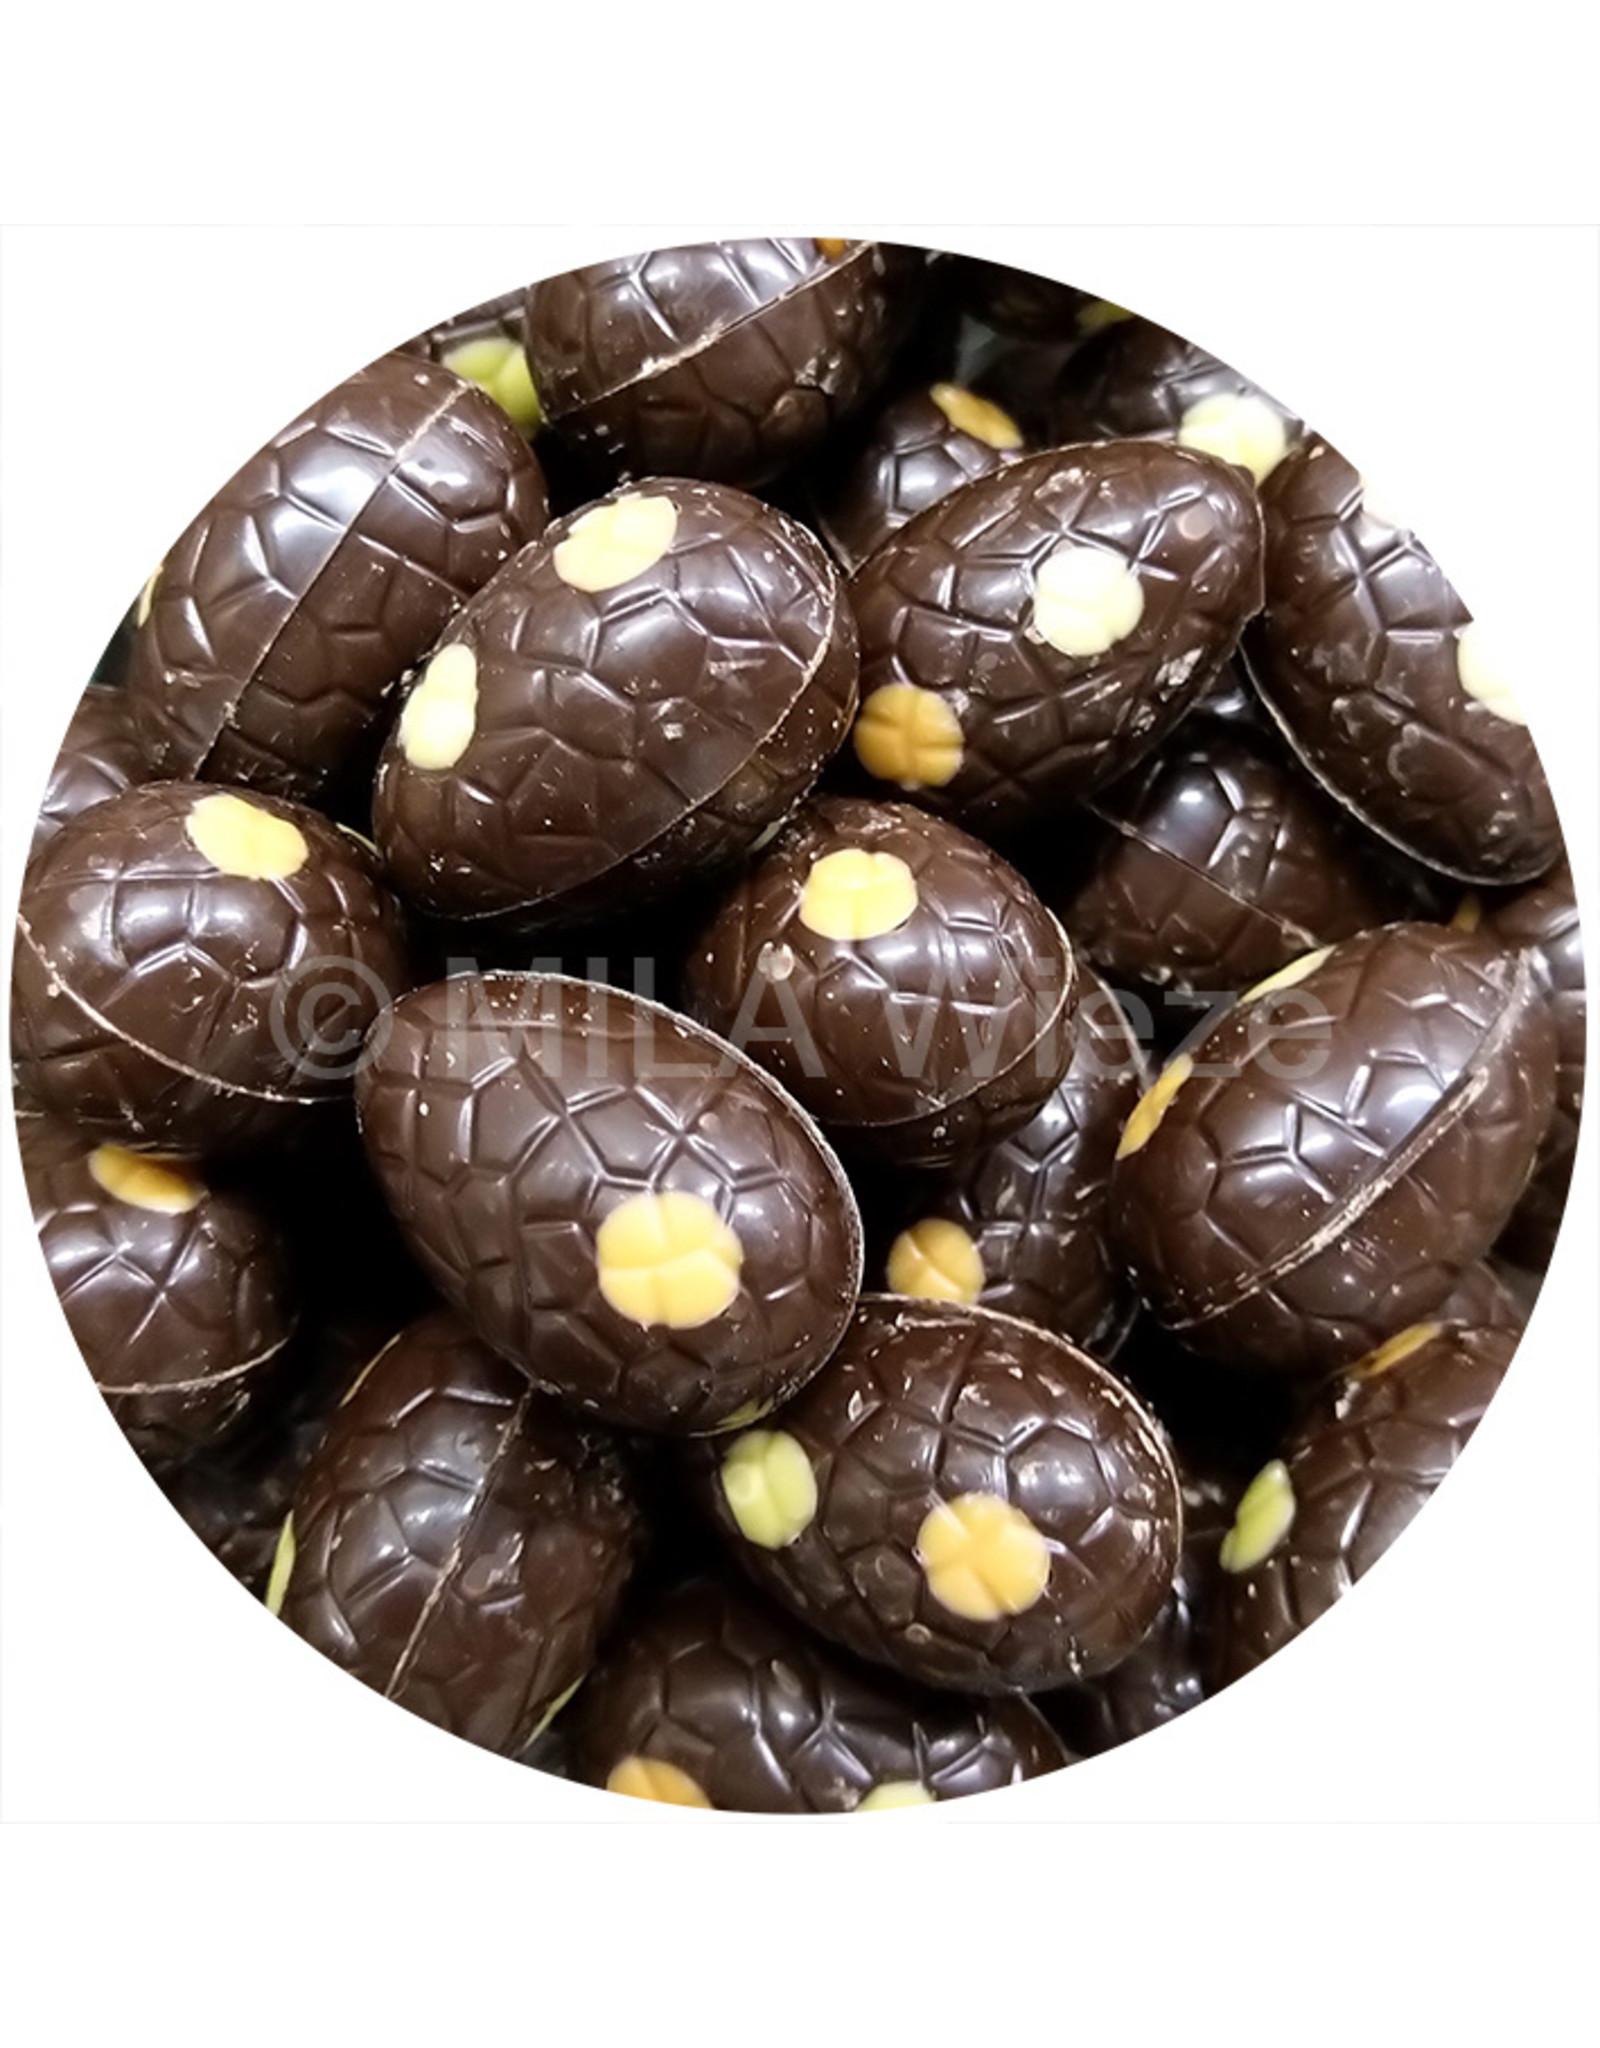 Paaseitjes Deco - Fondant - Gezouten caramel